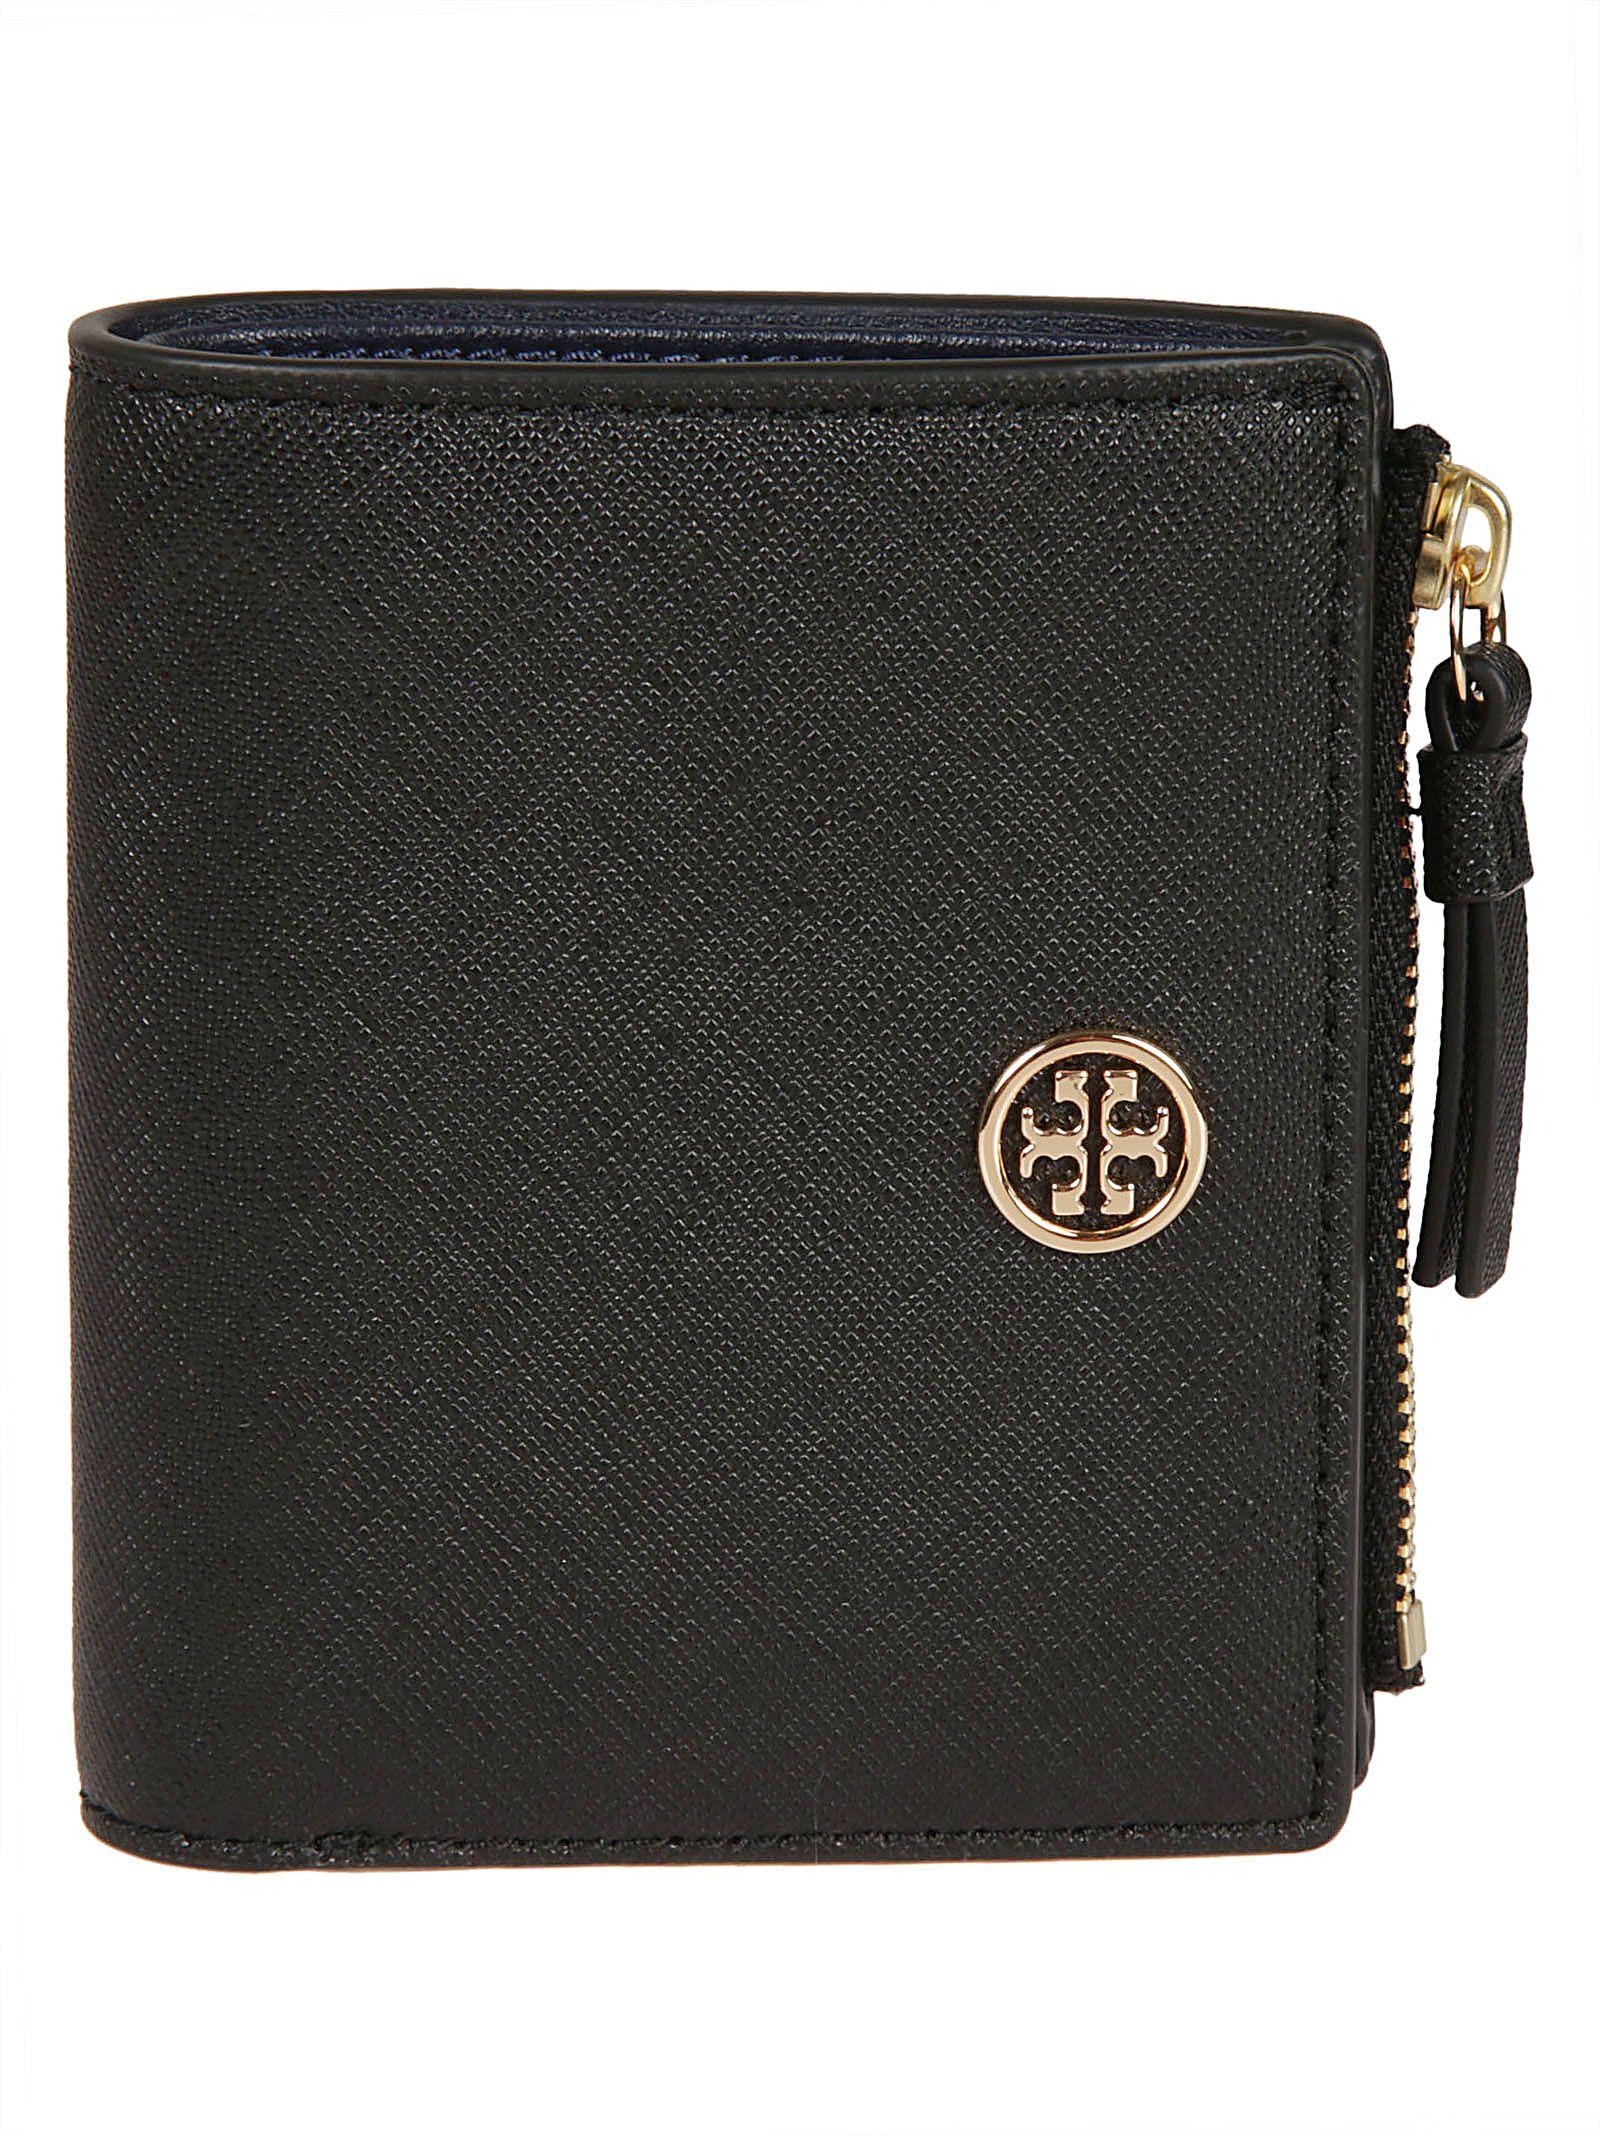 447e36310 Tory Burch Tory Burch Robinson Mini Wallet - Black - 10708683